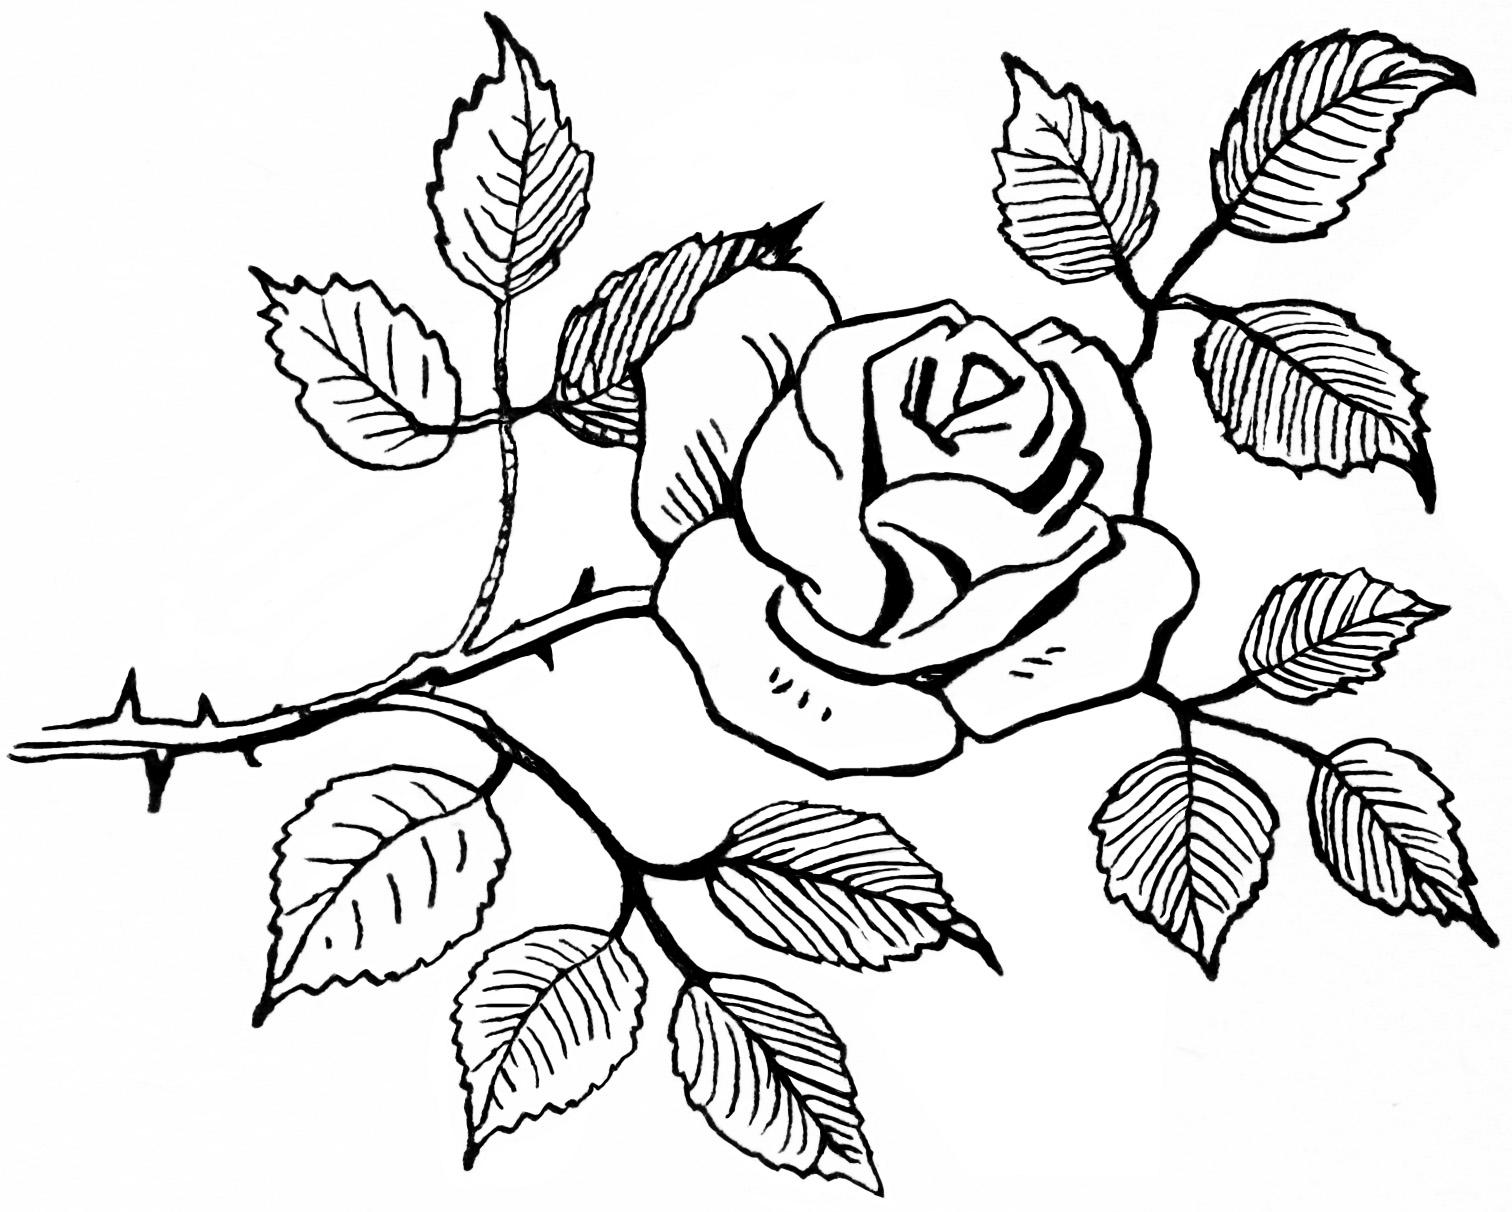 Free Sketch Cliparts, Download Free Clip Art, Free Clip Art.